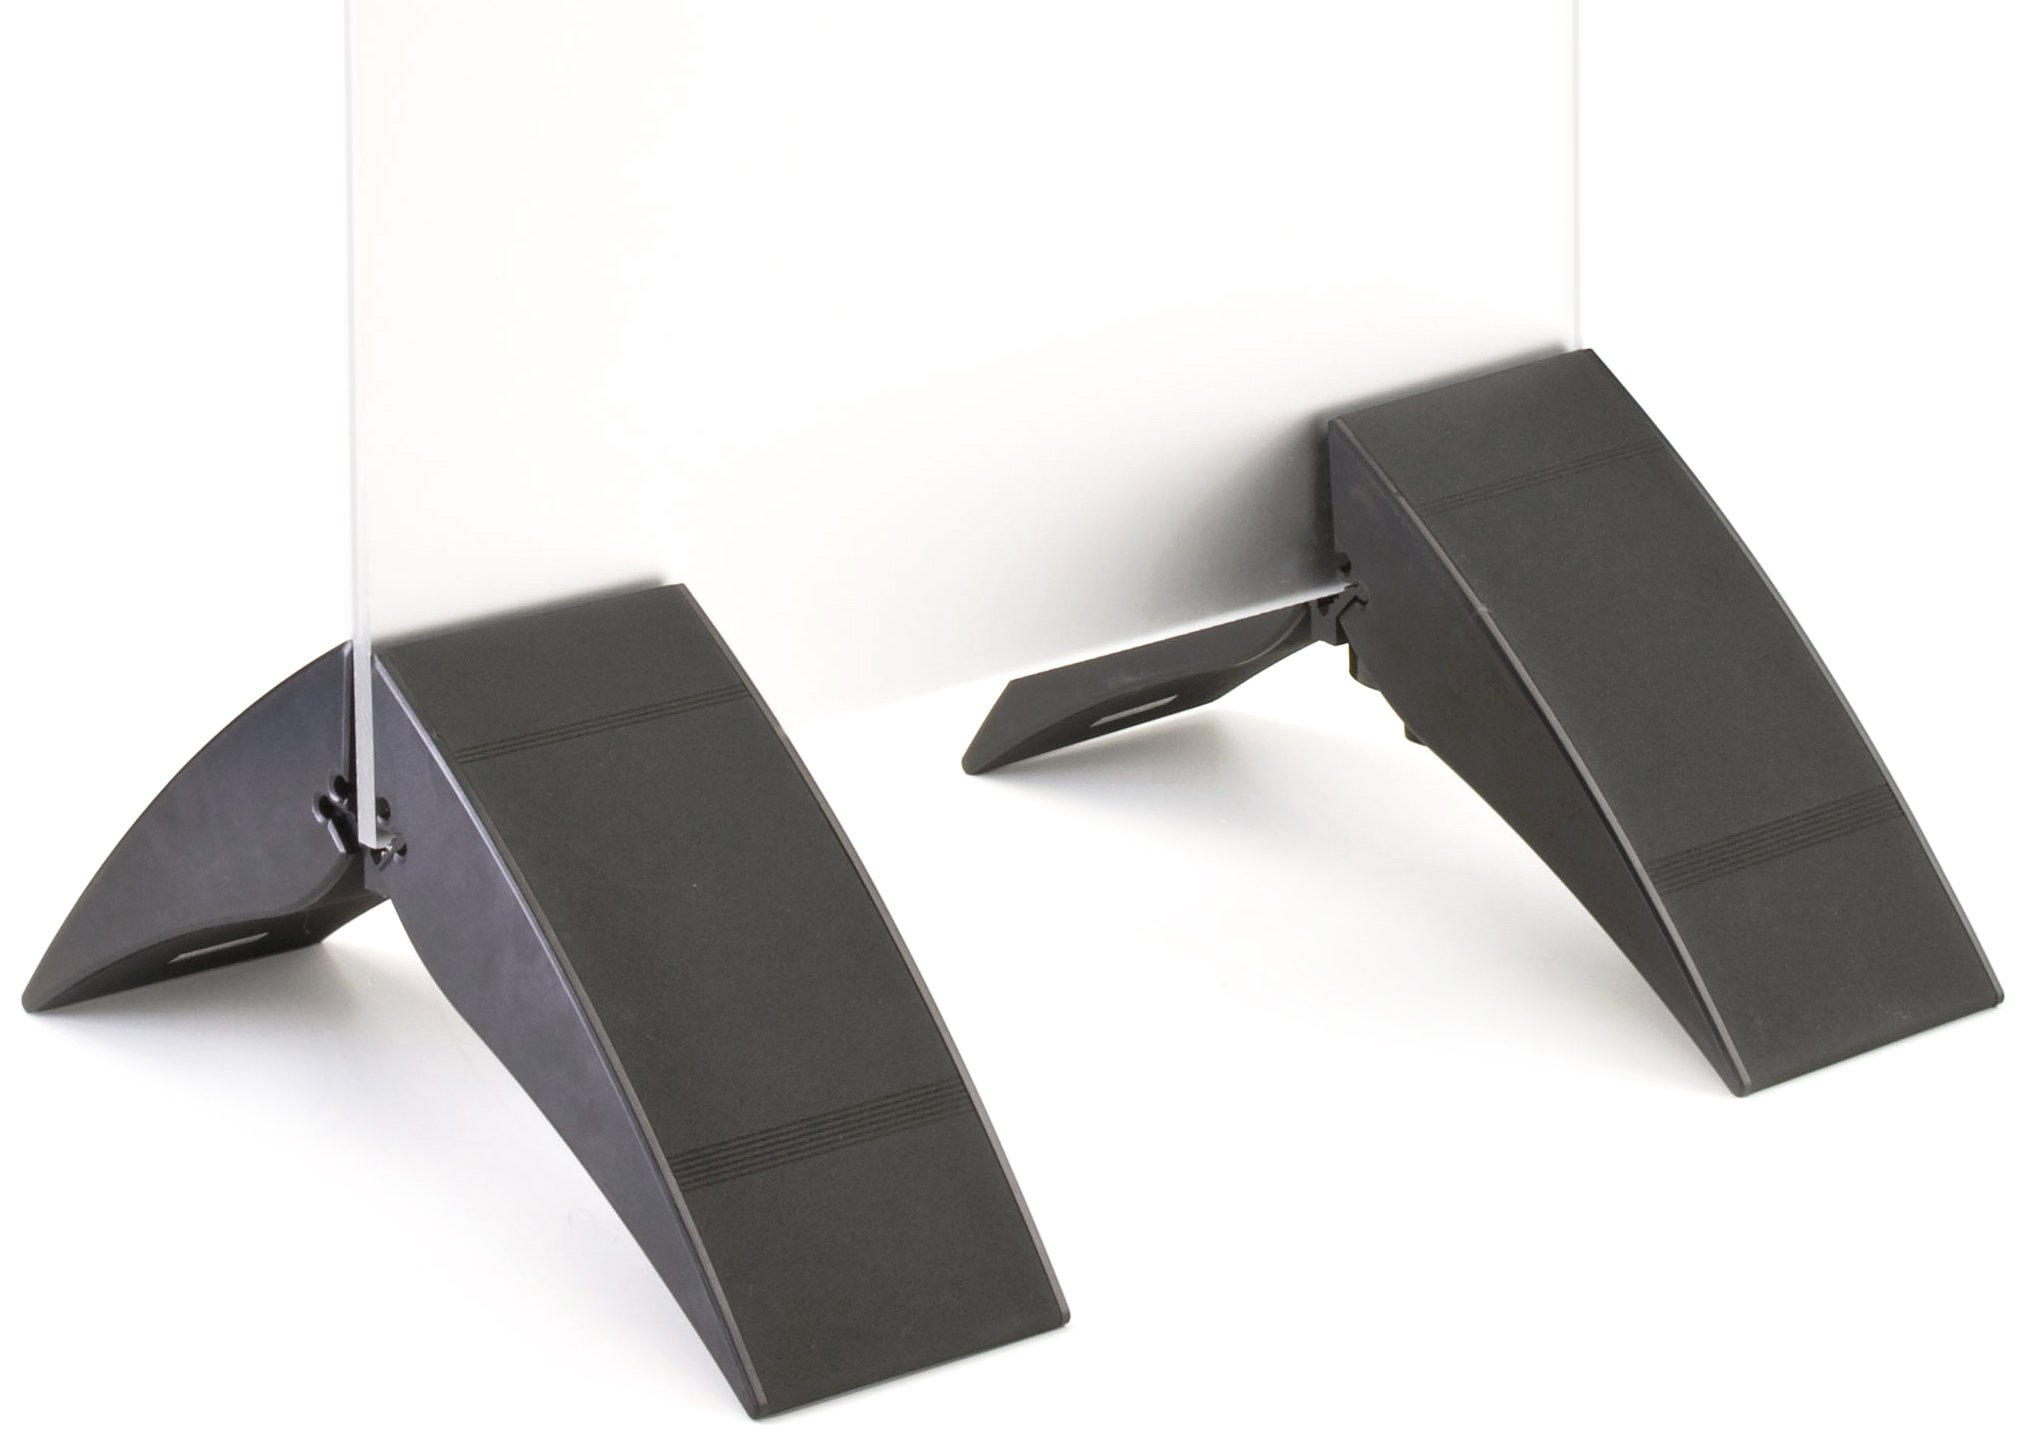 Displays2go Floor-standing Sign Holder Stand for Poster Boards, Set of 2 Sign Clamps for Displaying Different-sized Boards, Adjustable, Black, Aluminum (SET2BK10)